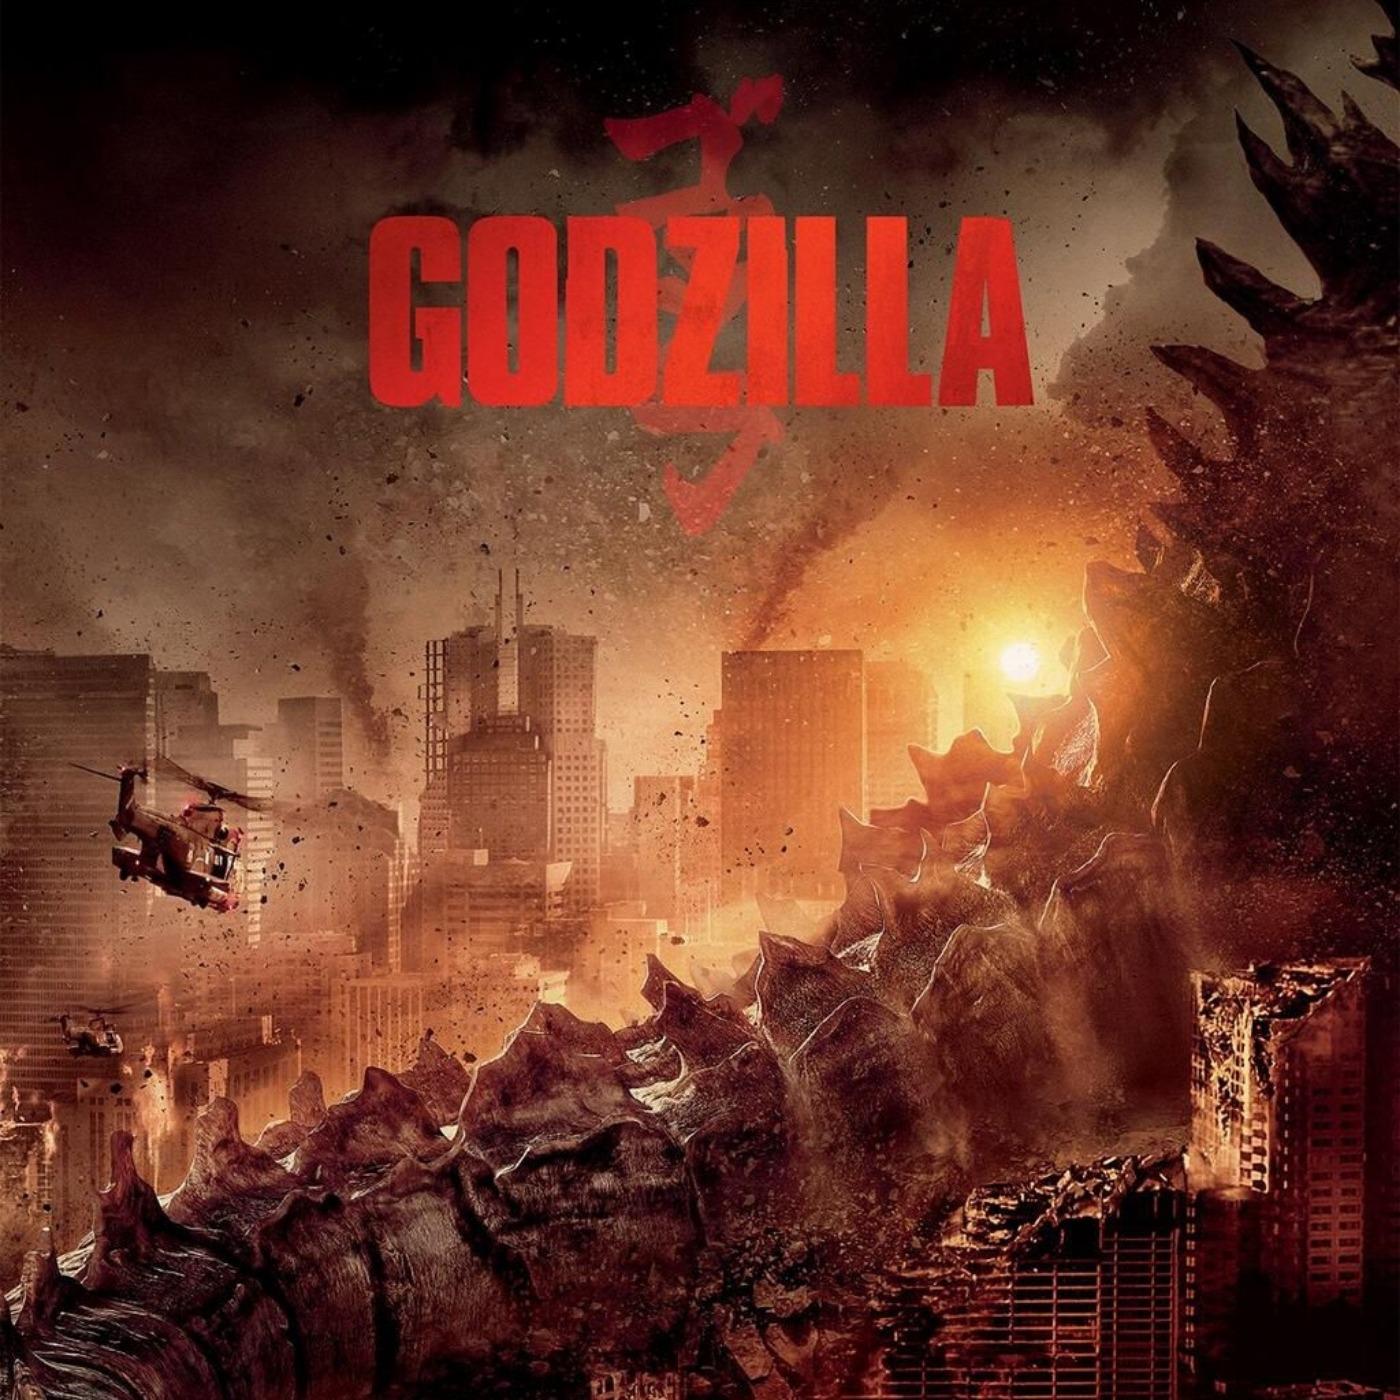 PODCAST CINEMA | CRITIQUE DU FILM GODZILLA (2014) | CinéMaRadio